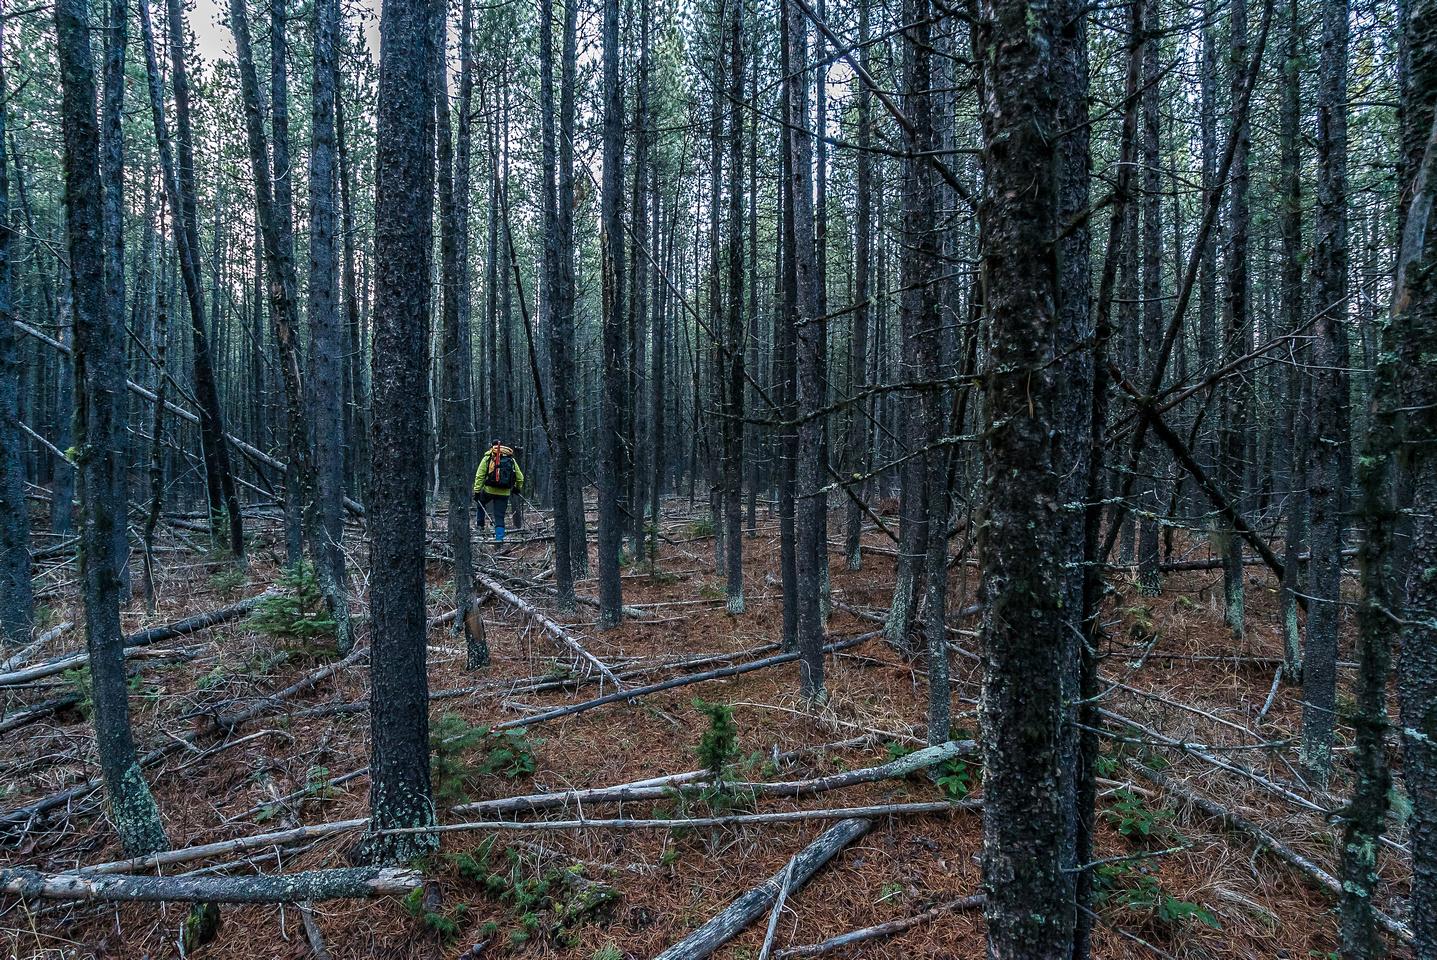 Classic Castle Wilderness matchstick forest